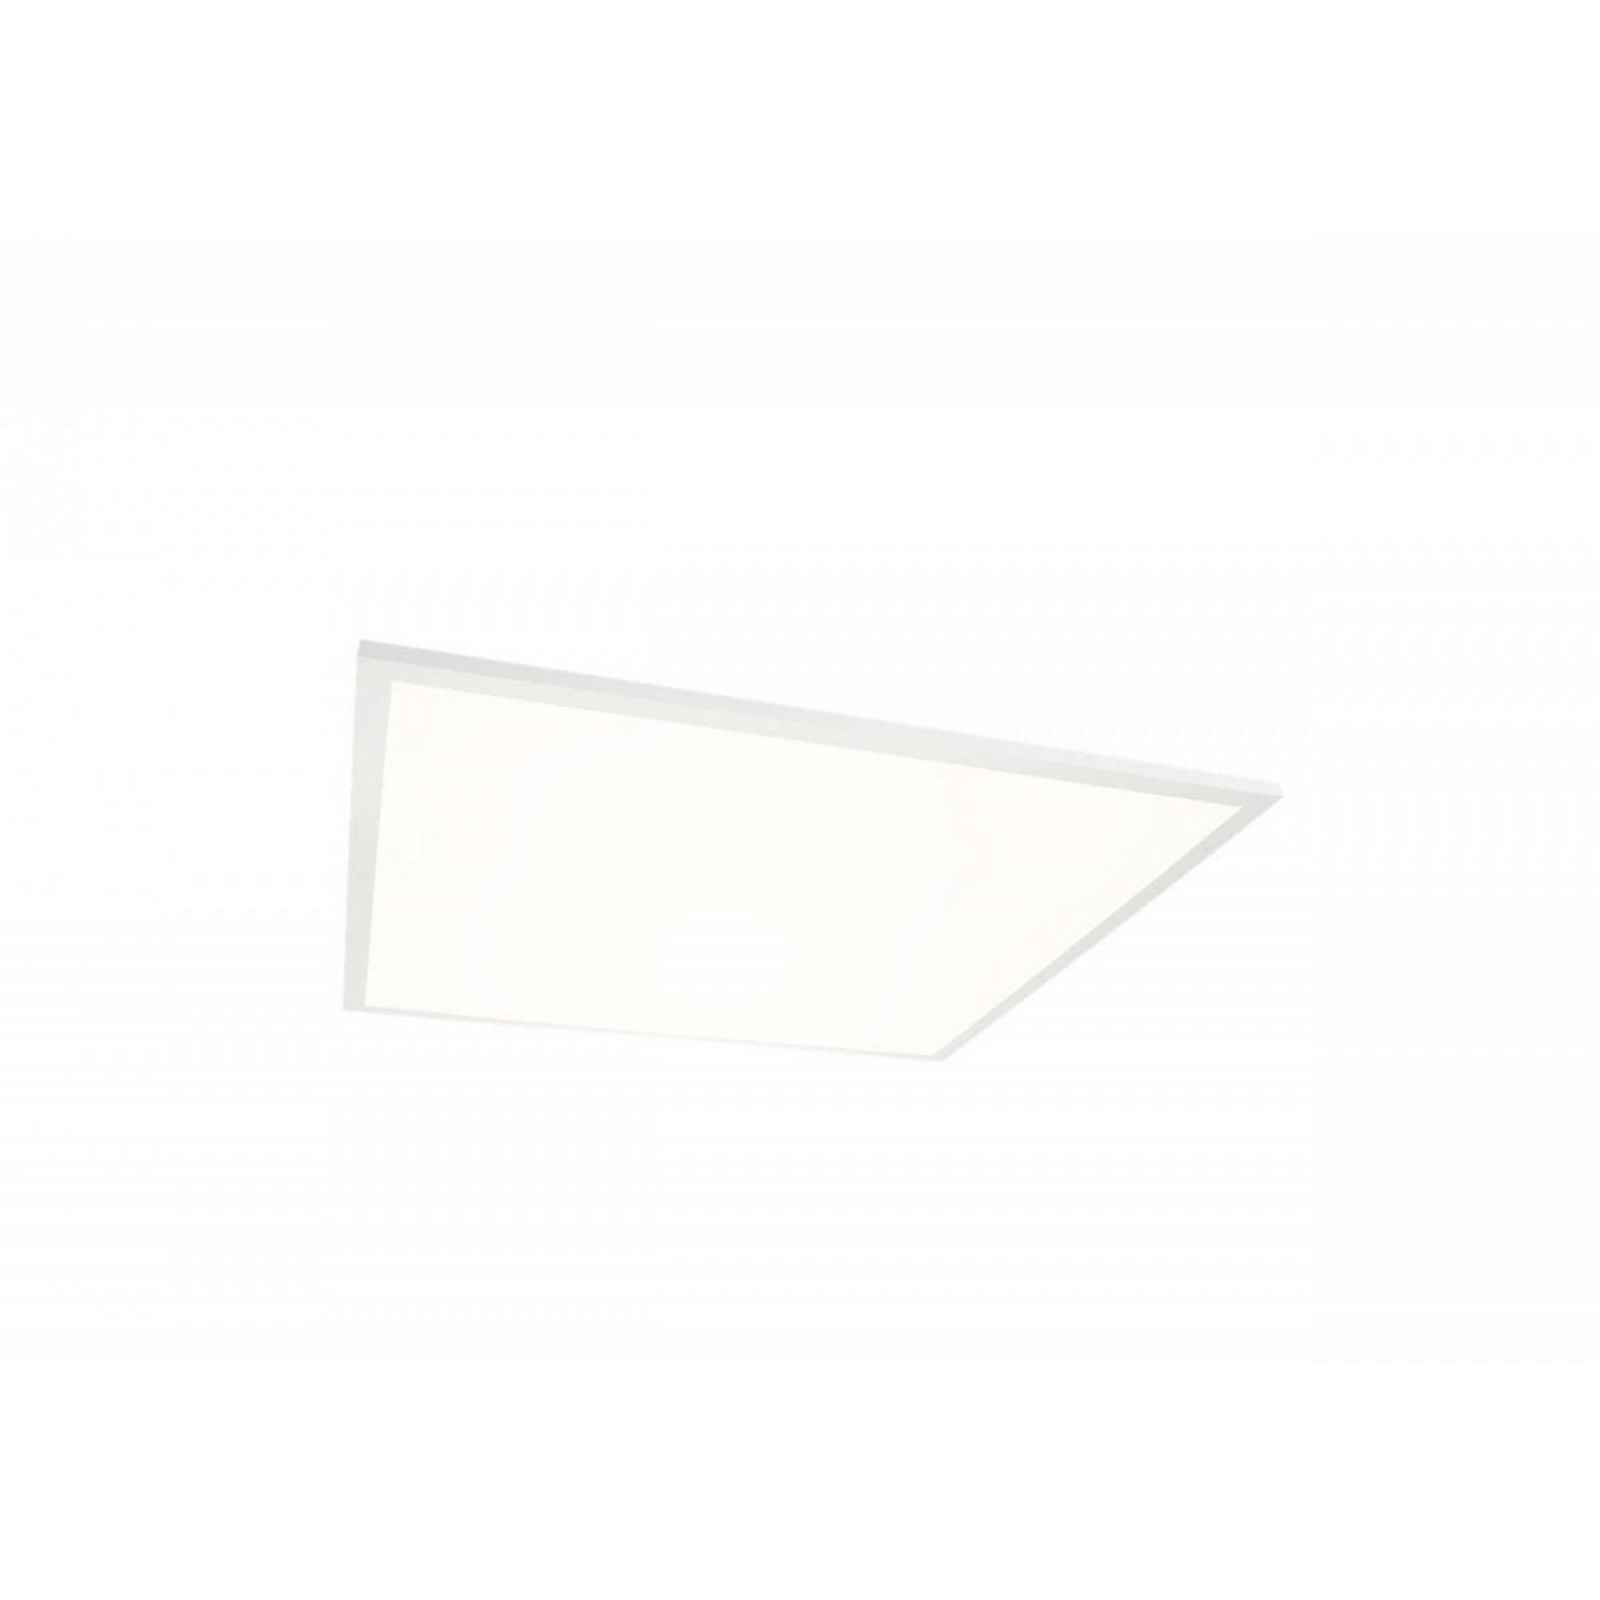 Panel LED UGR Philips Ledinaire RC065B, 38 W, 3400 lm, IP 20